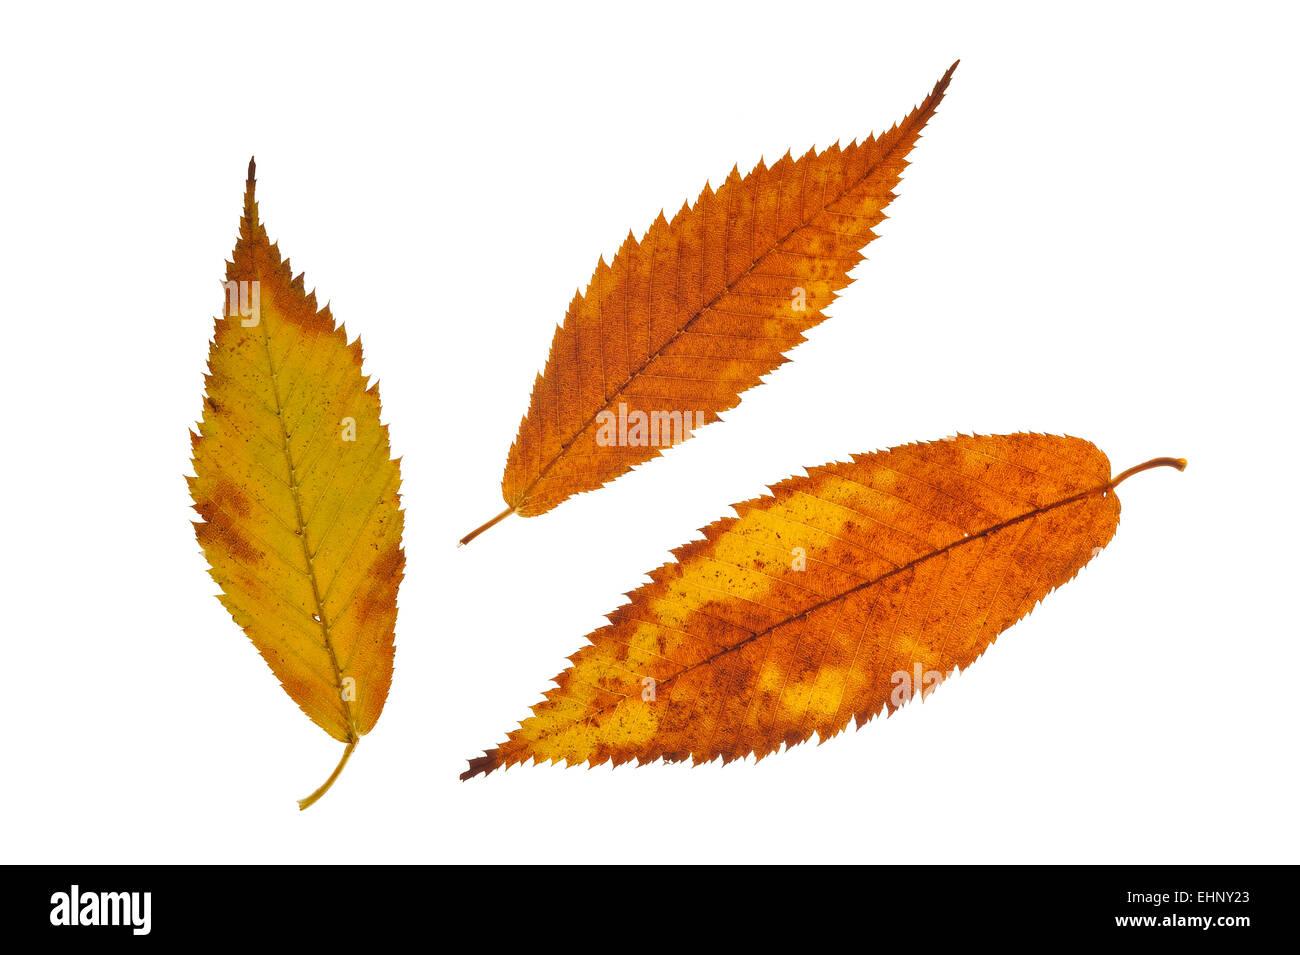 Hornbeam maple (Acer carpinifolium) leaves in autumn colours, native to Japan against white background - Stock Image